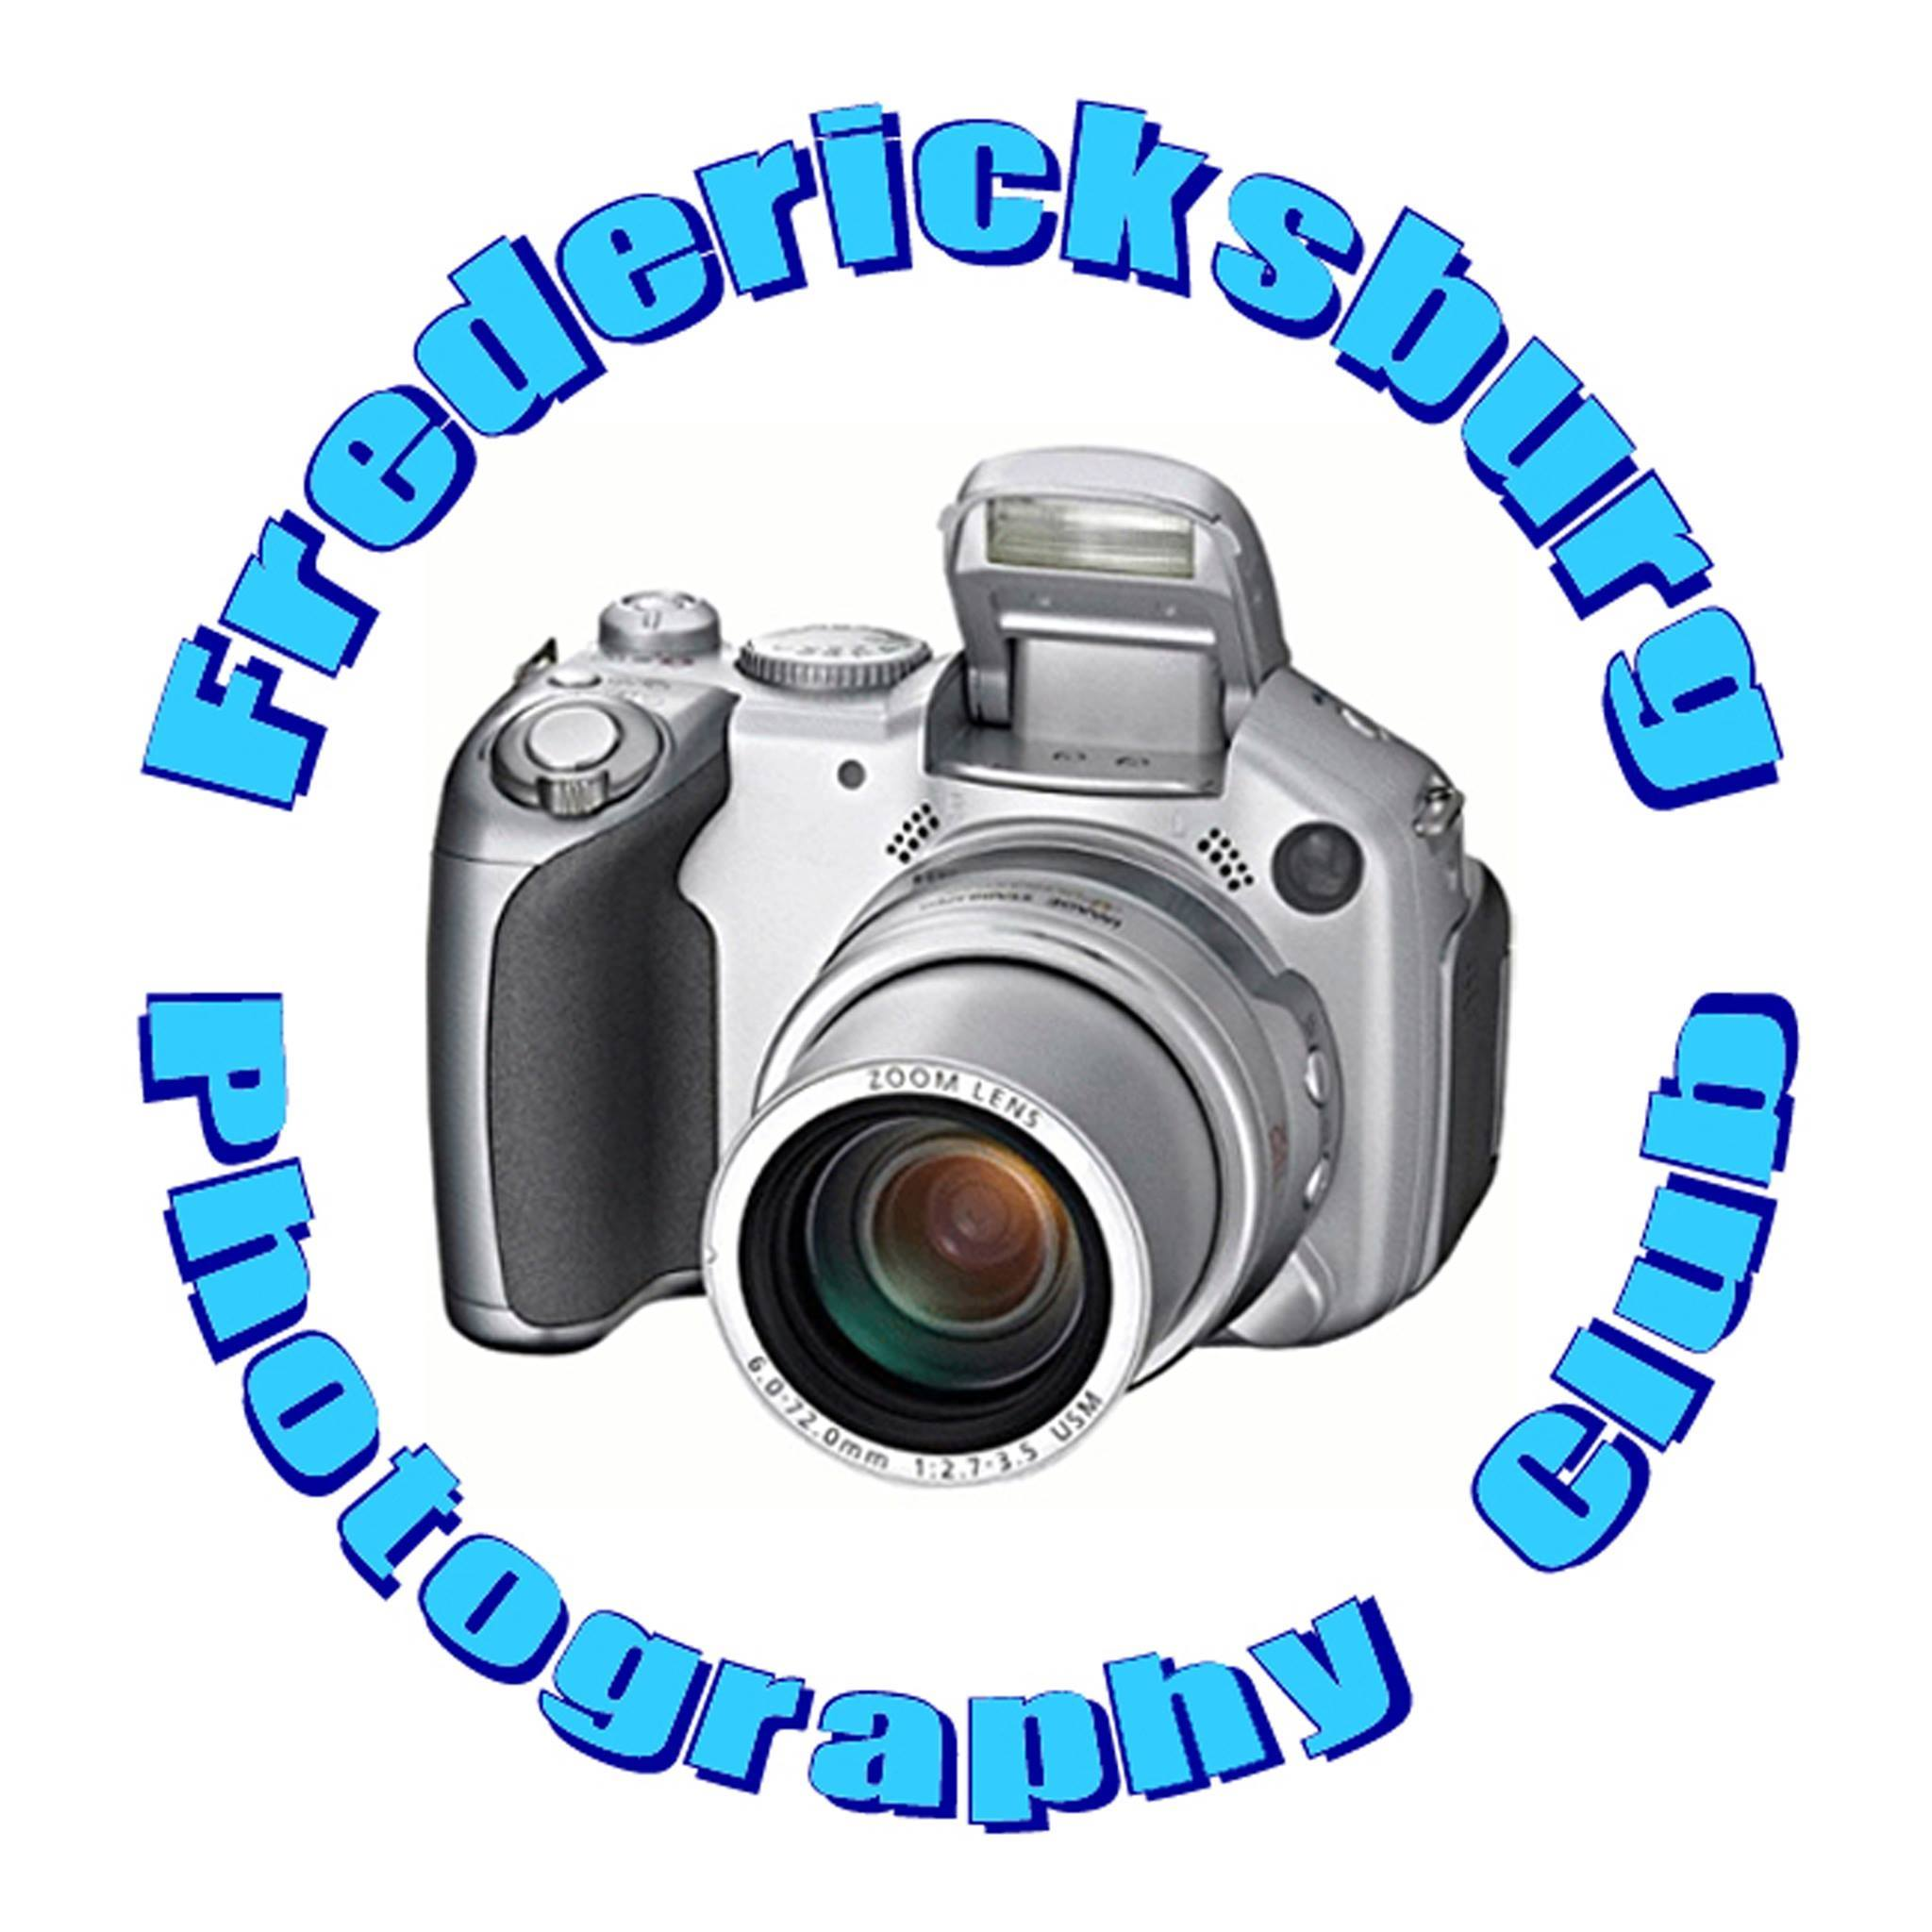 Fredericksburg Photography Club